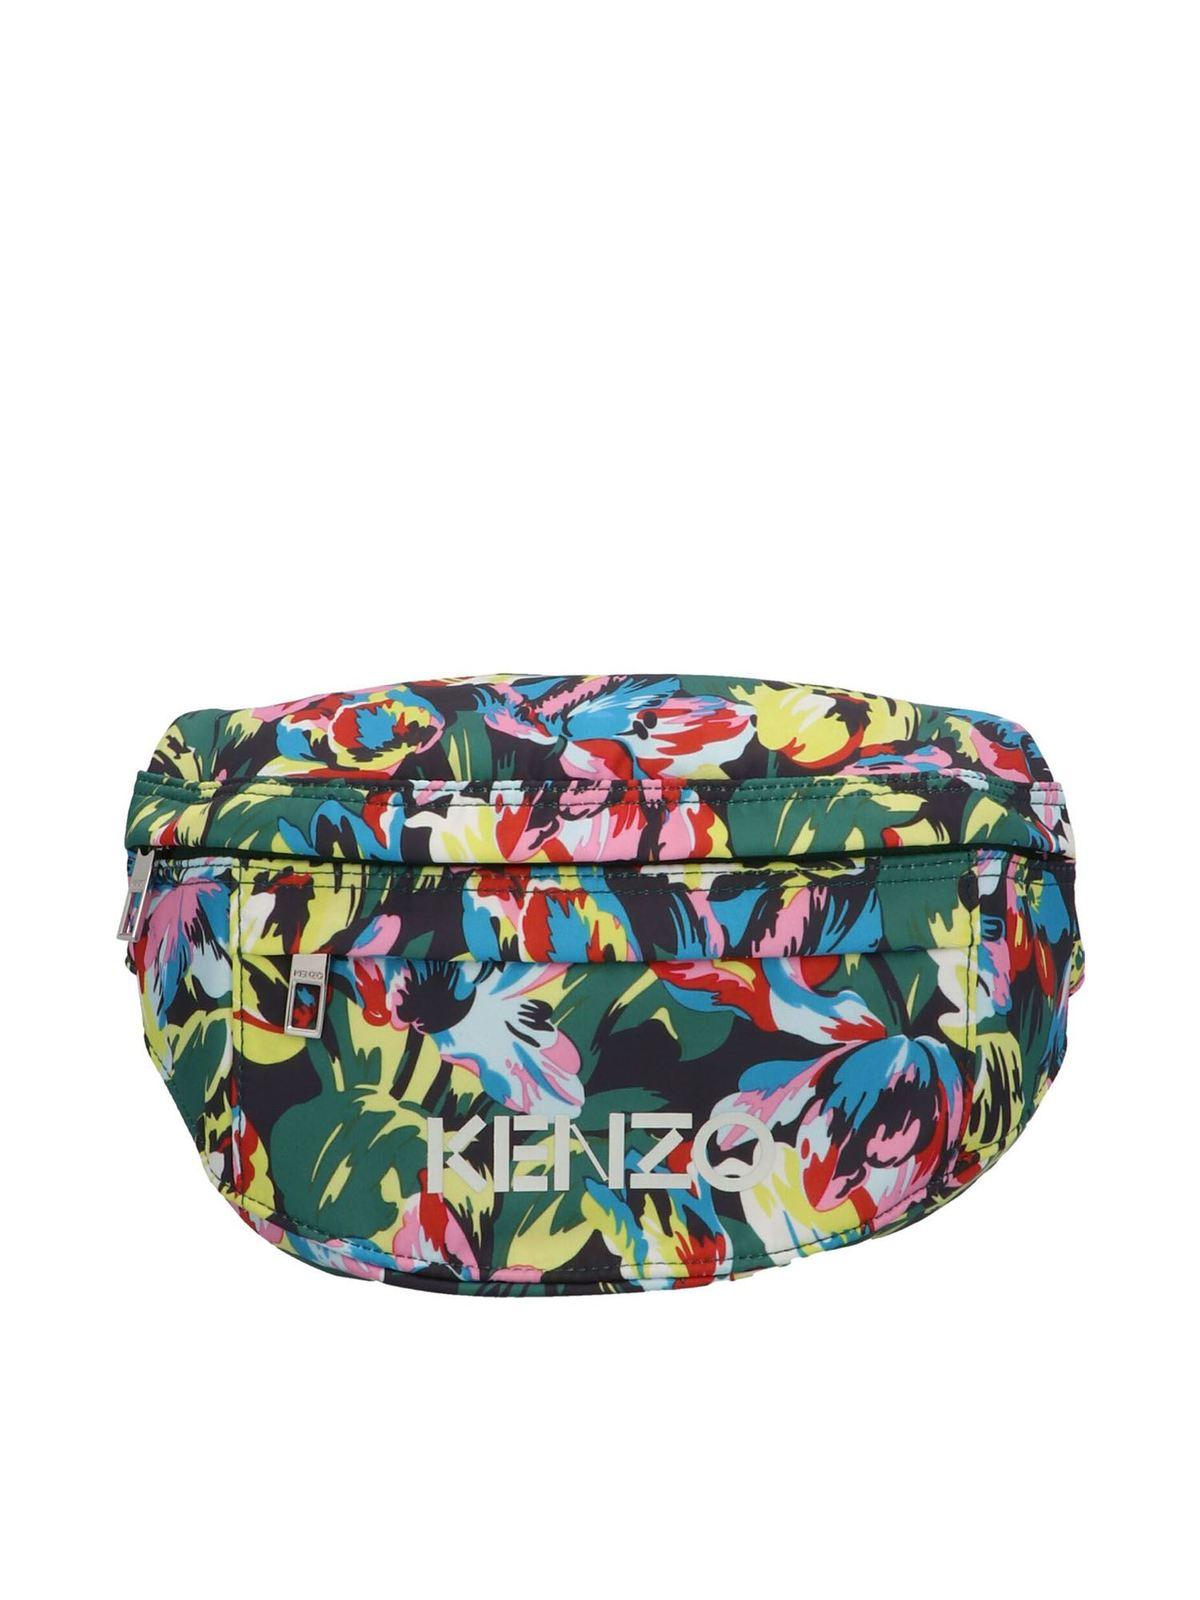 Kenzo X Vans Belt Bag In Multicolor In Multicolour